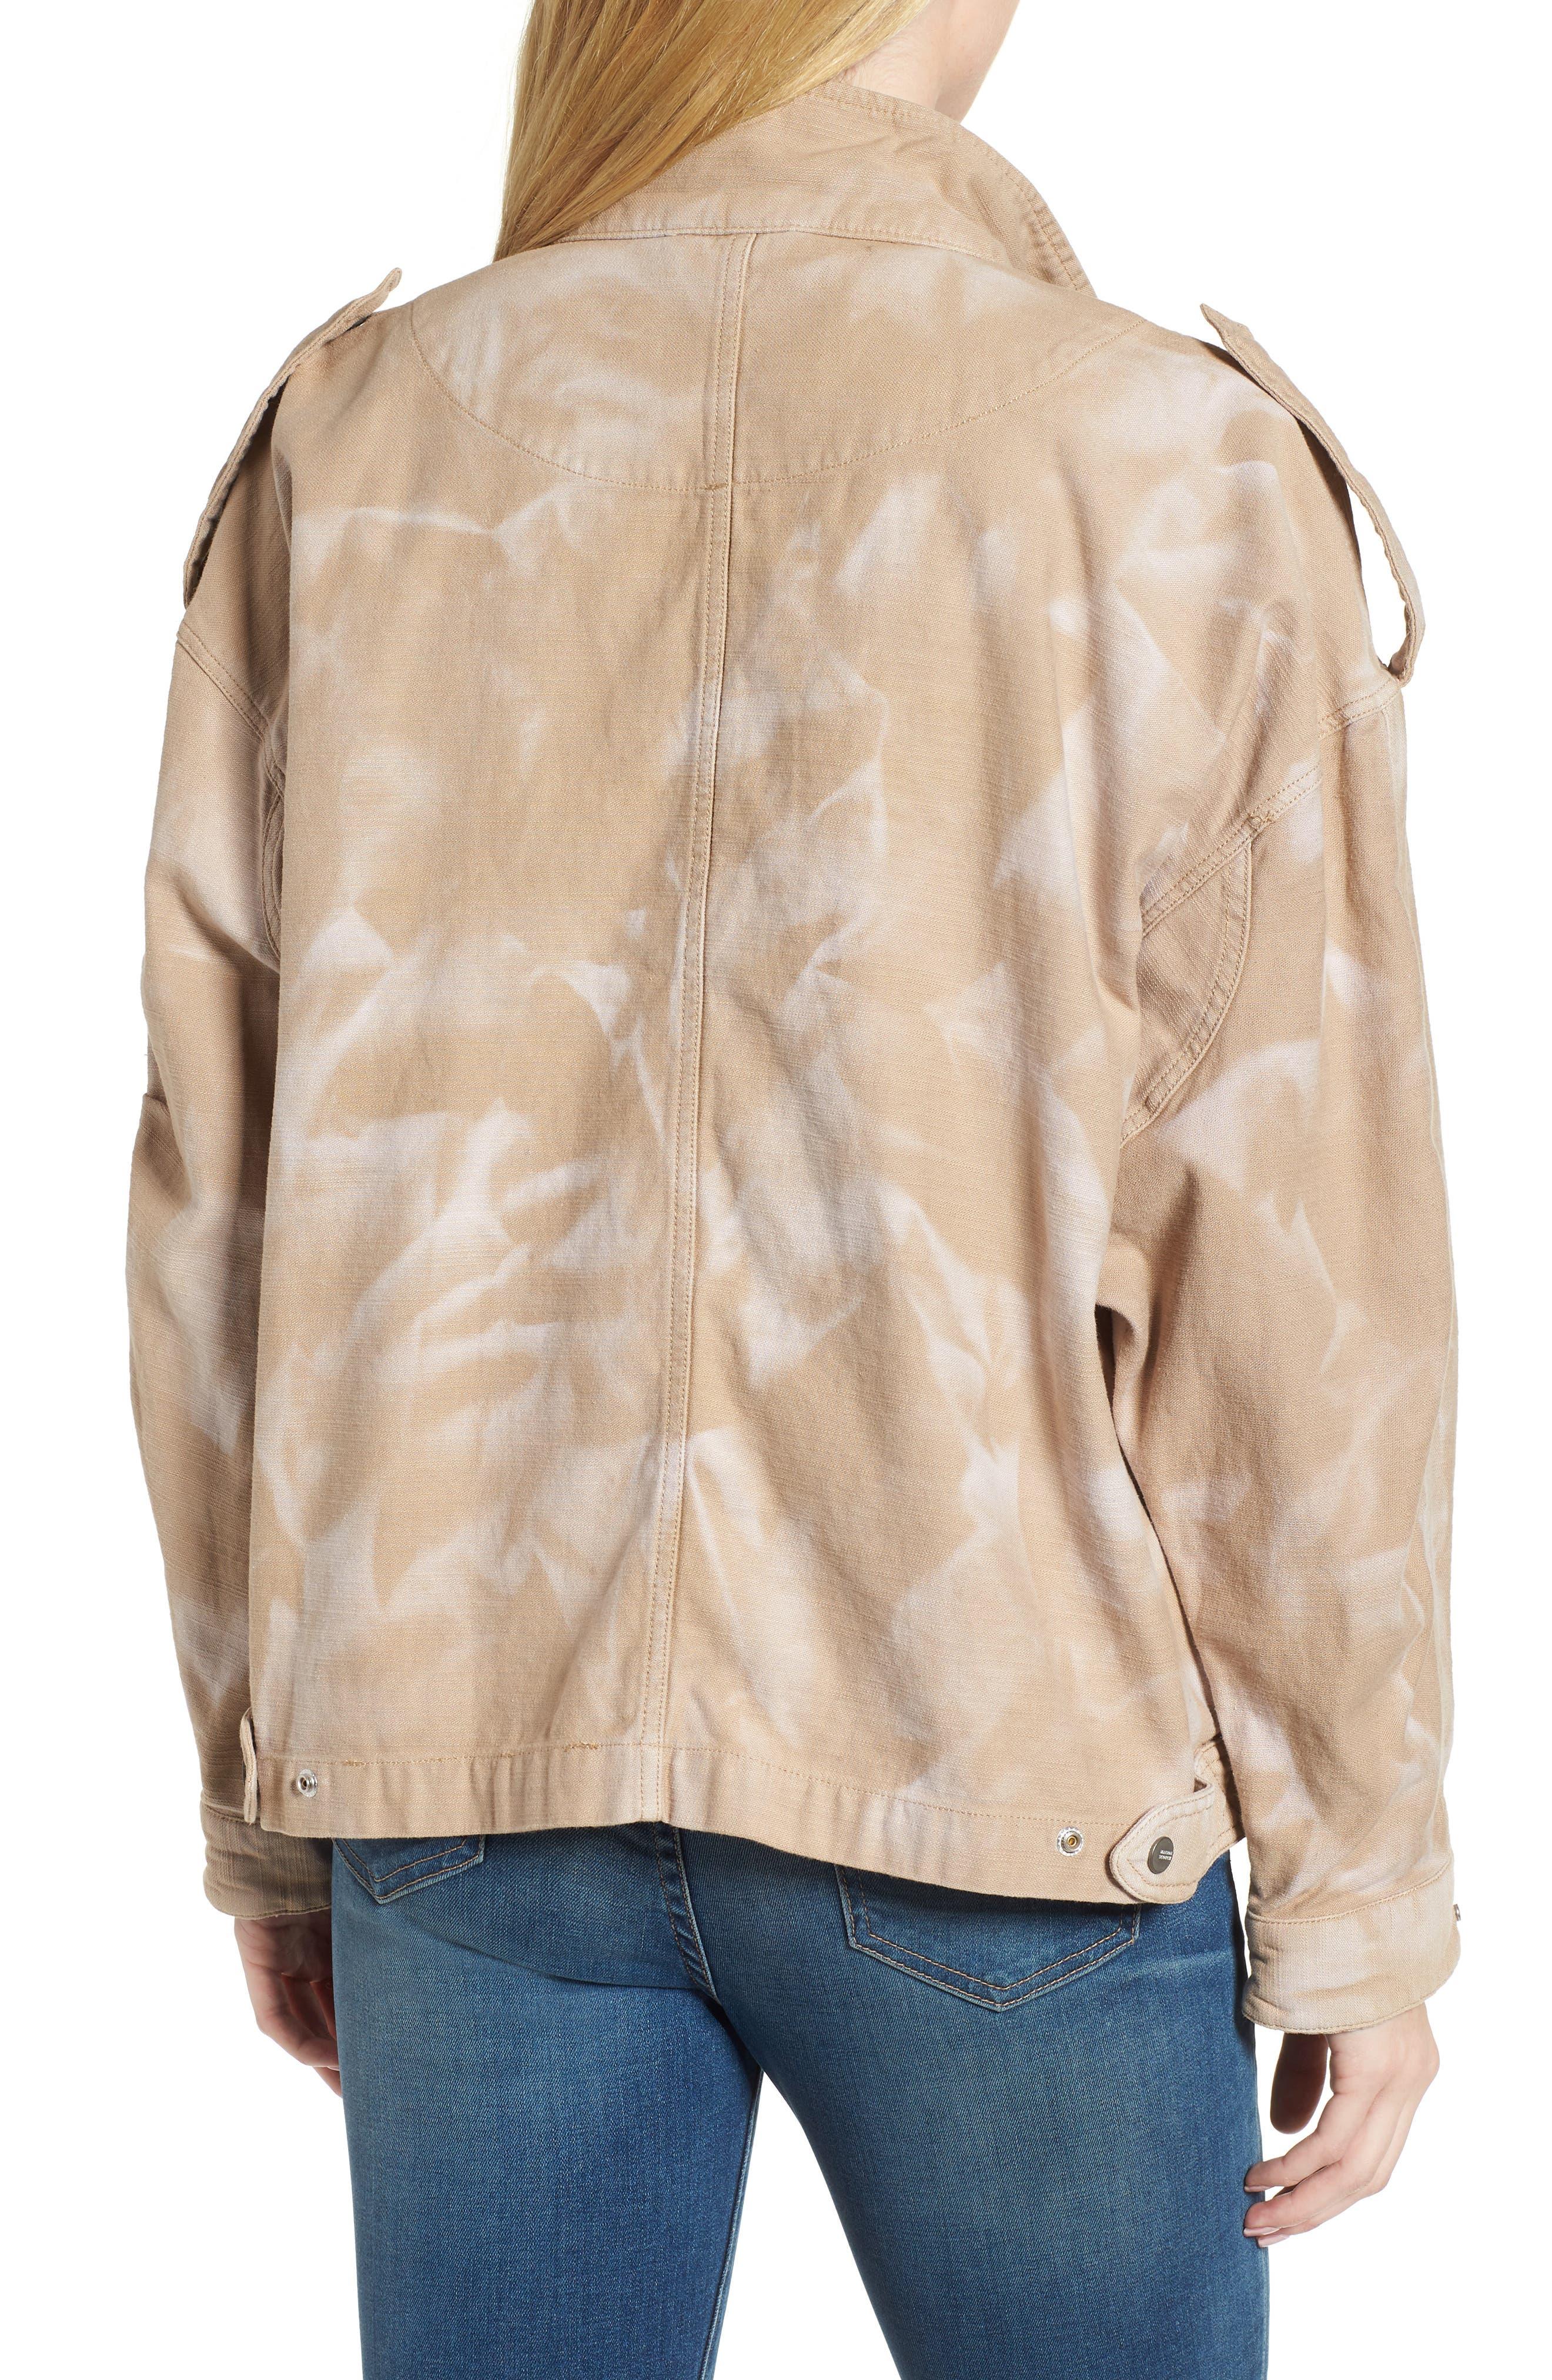 Oversize Military Jacket,                             Alternate thumbnail 2, color,                             270